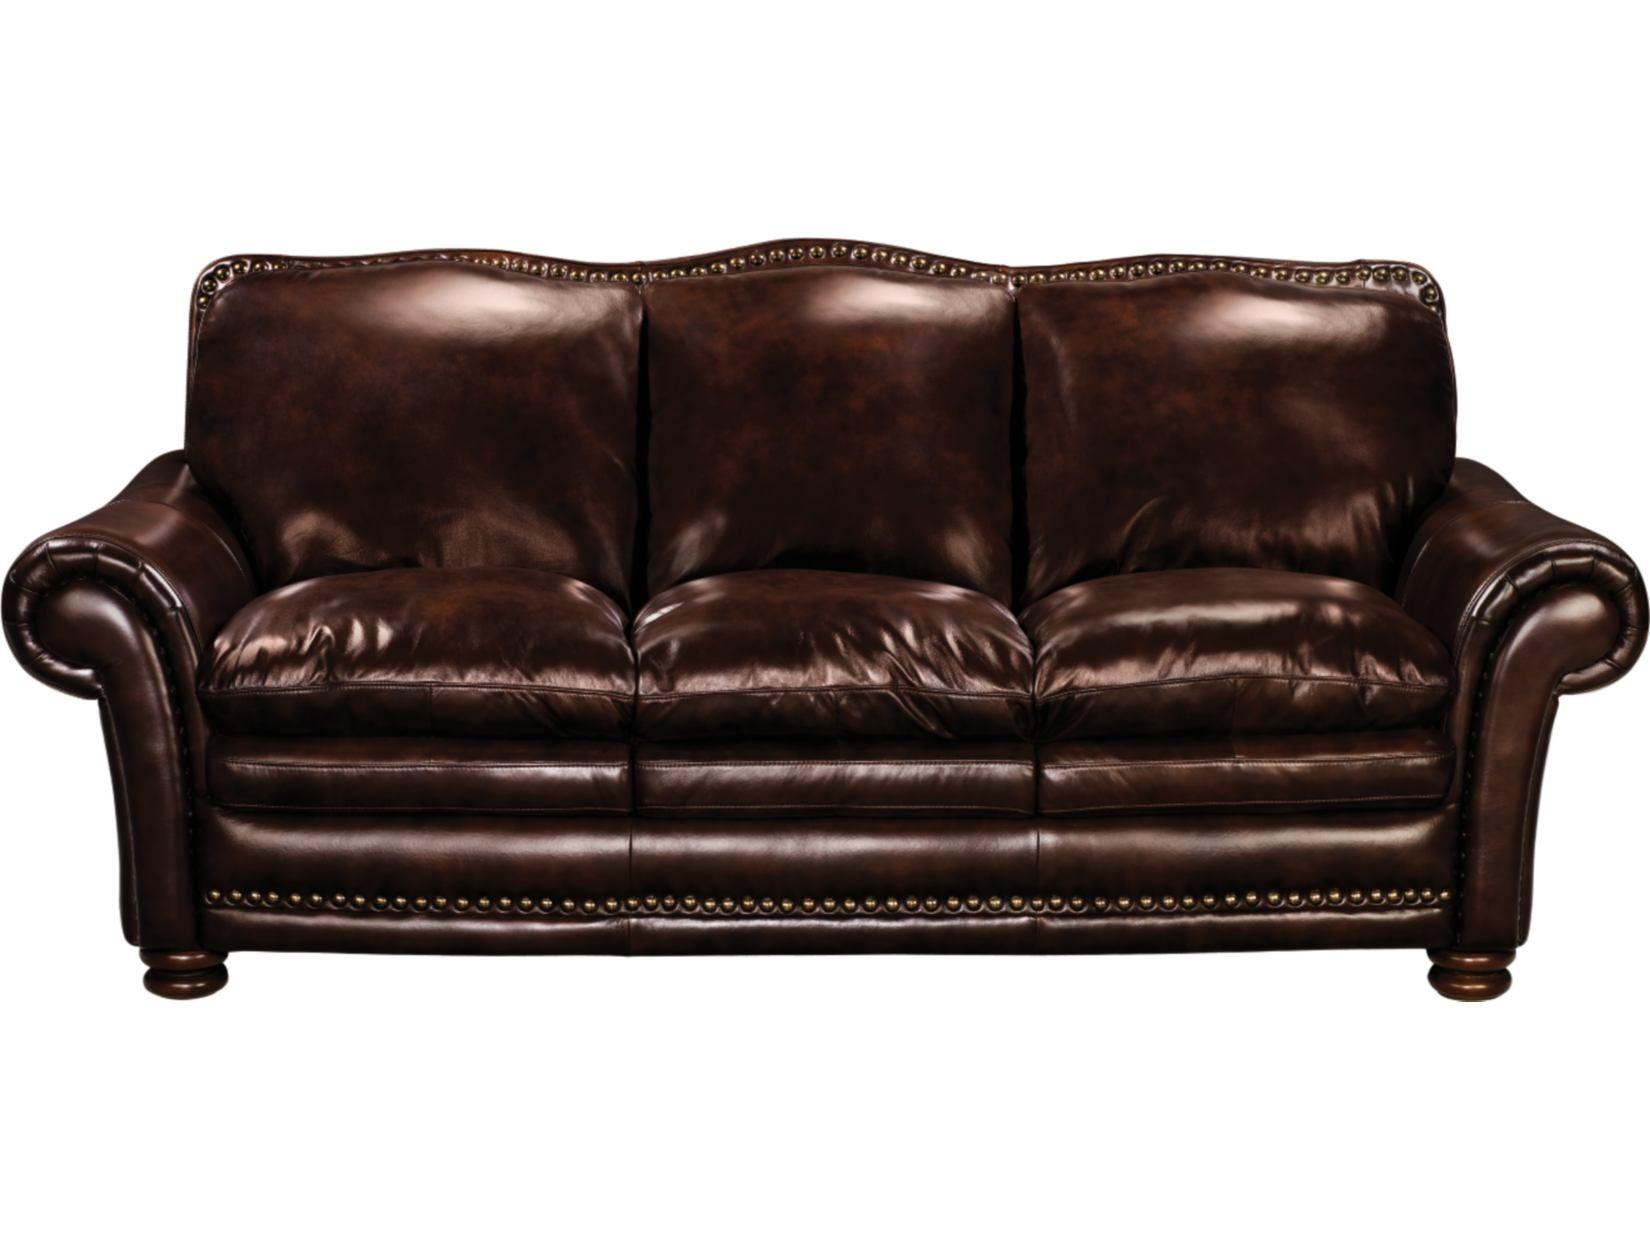 Mckinsley Burgundy Leather Sofa American Signature Furniture American Signature Furniture Living Room Leather Brown Leather Sofa Decor